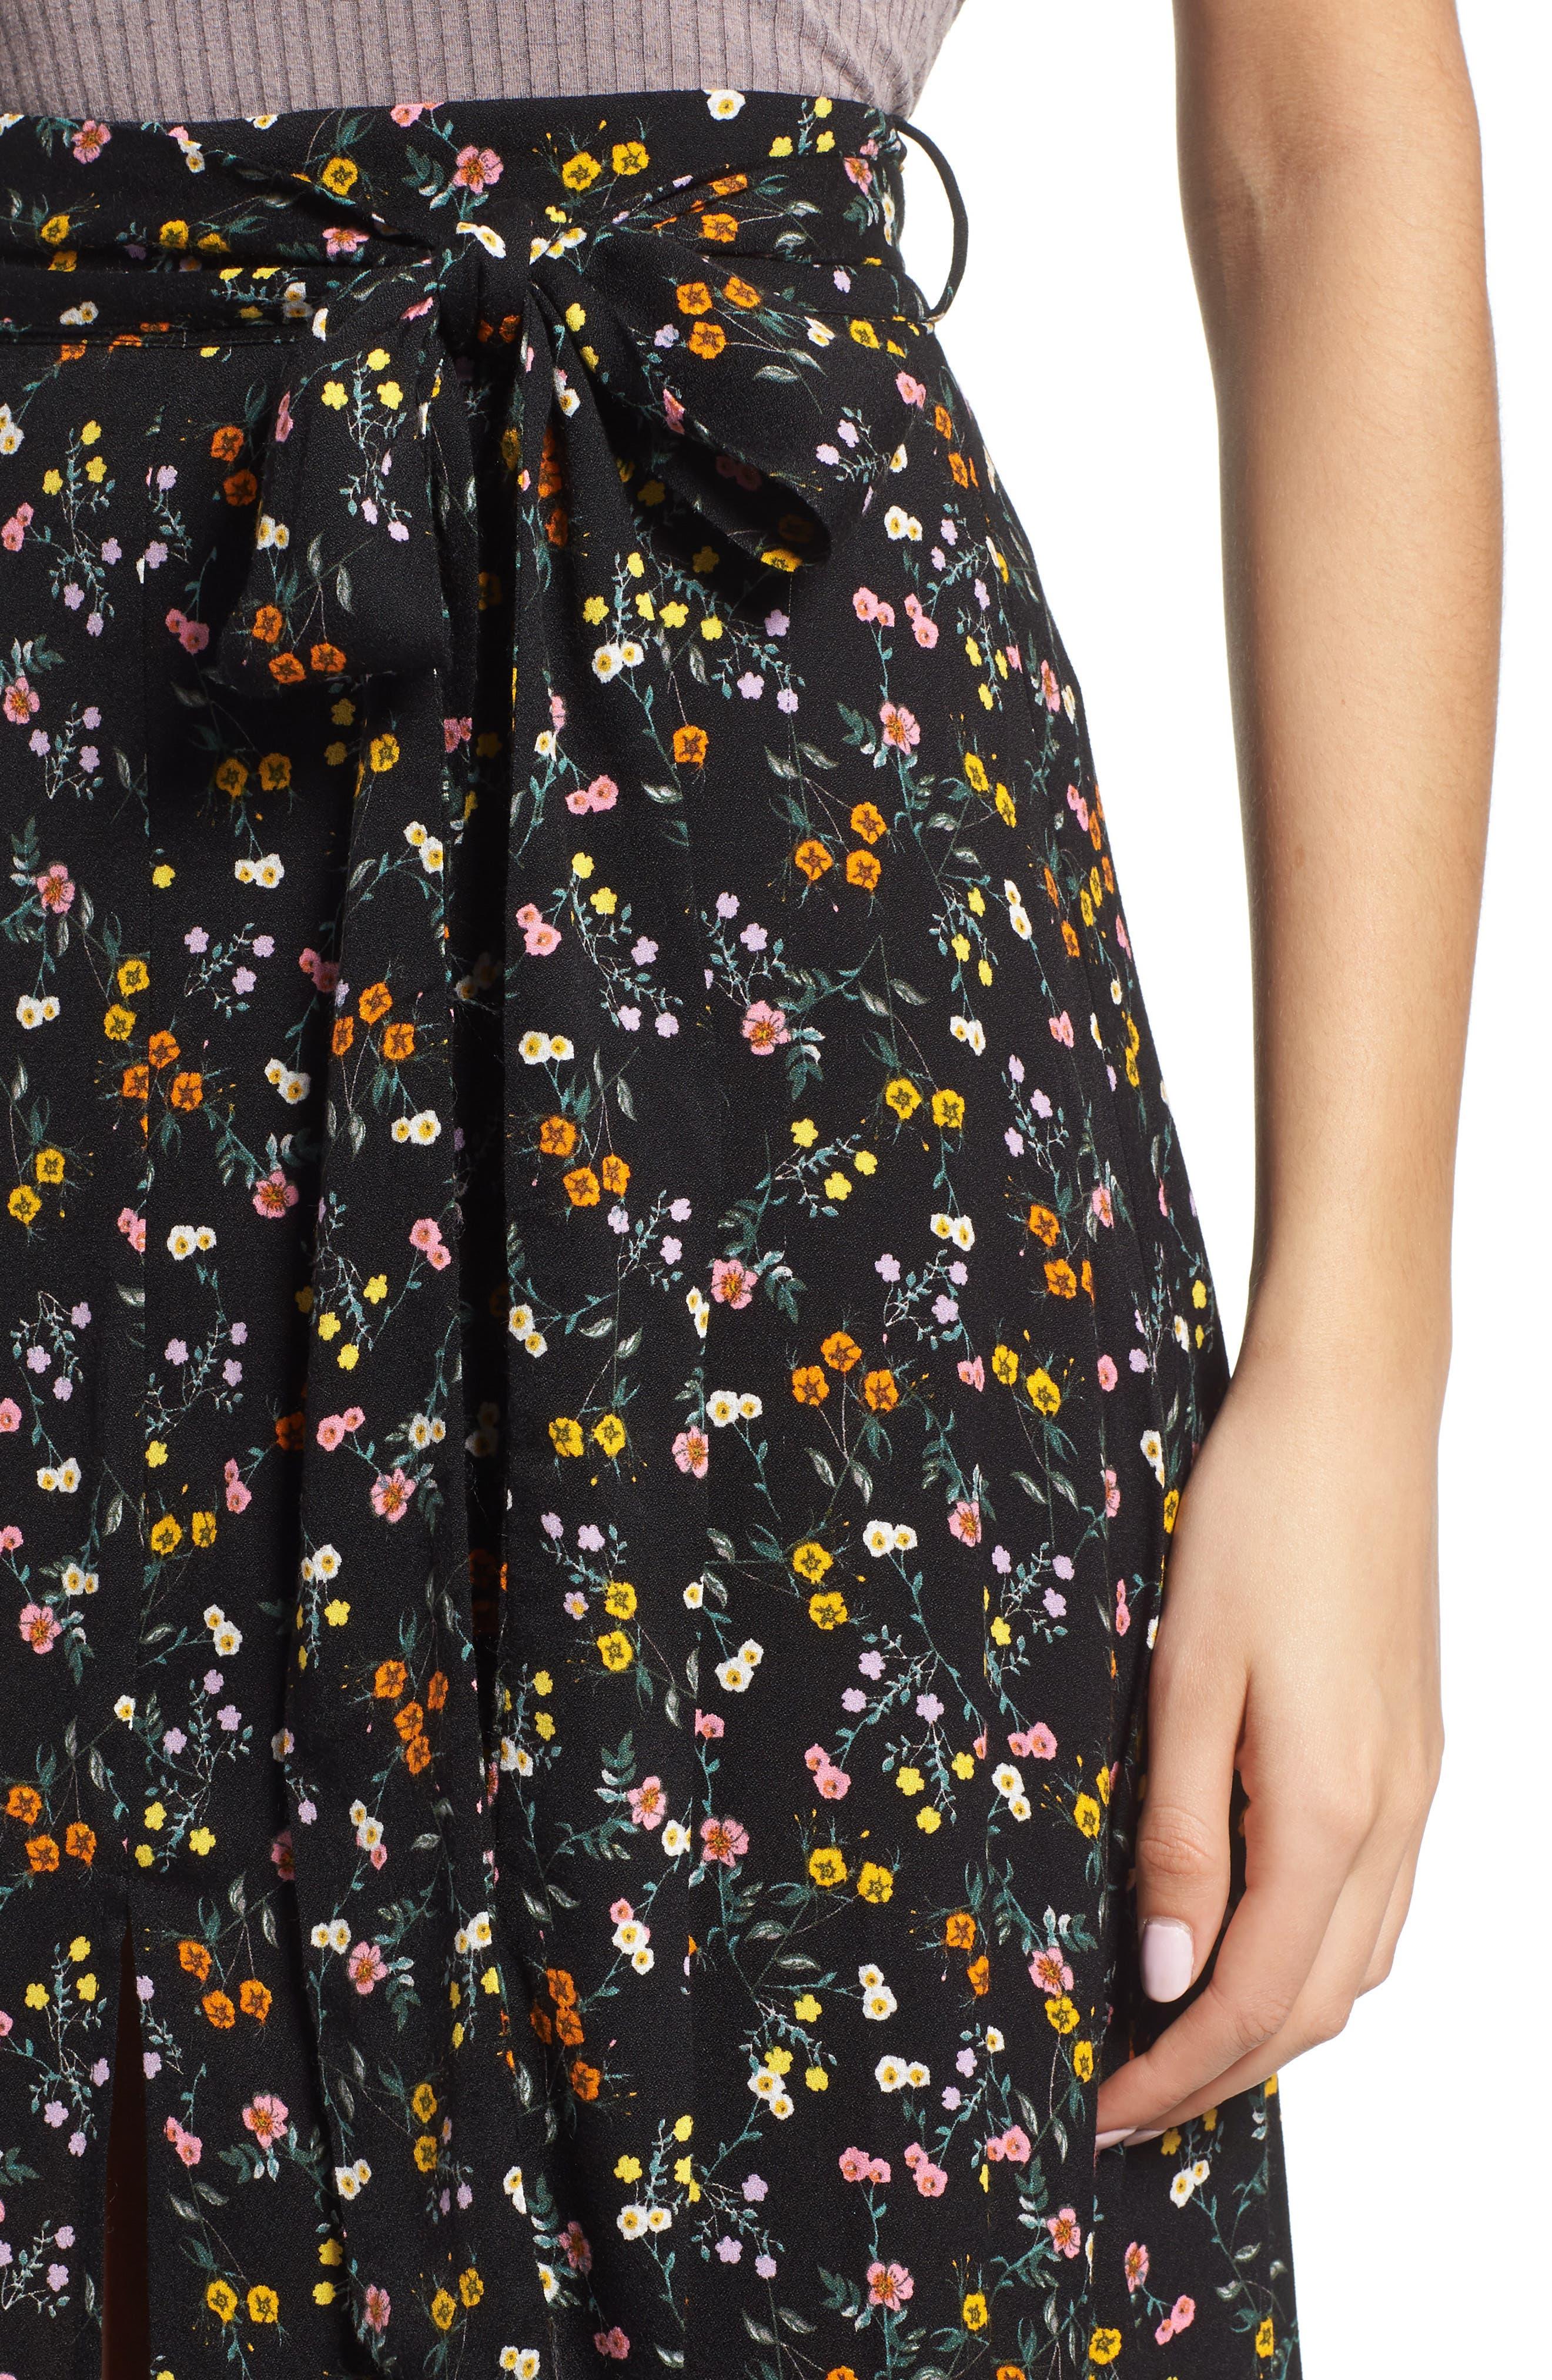 Alessandra Maxi Skirt,                             Alternate thumbnail 4, color,                             Noir Petite Fleur